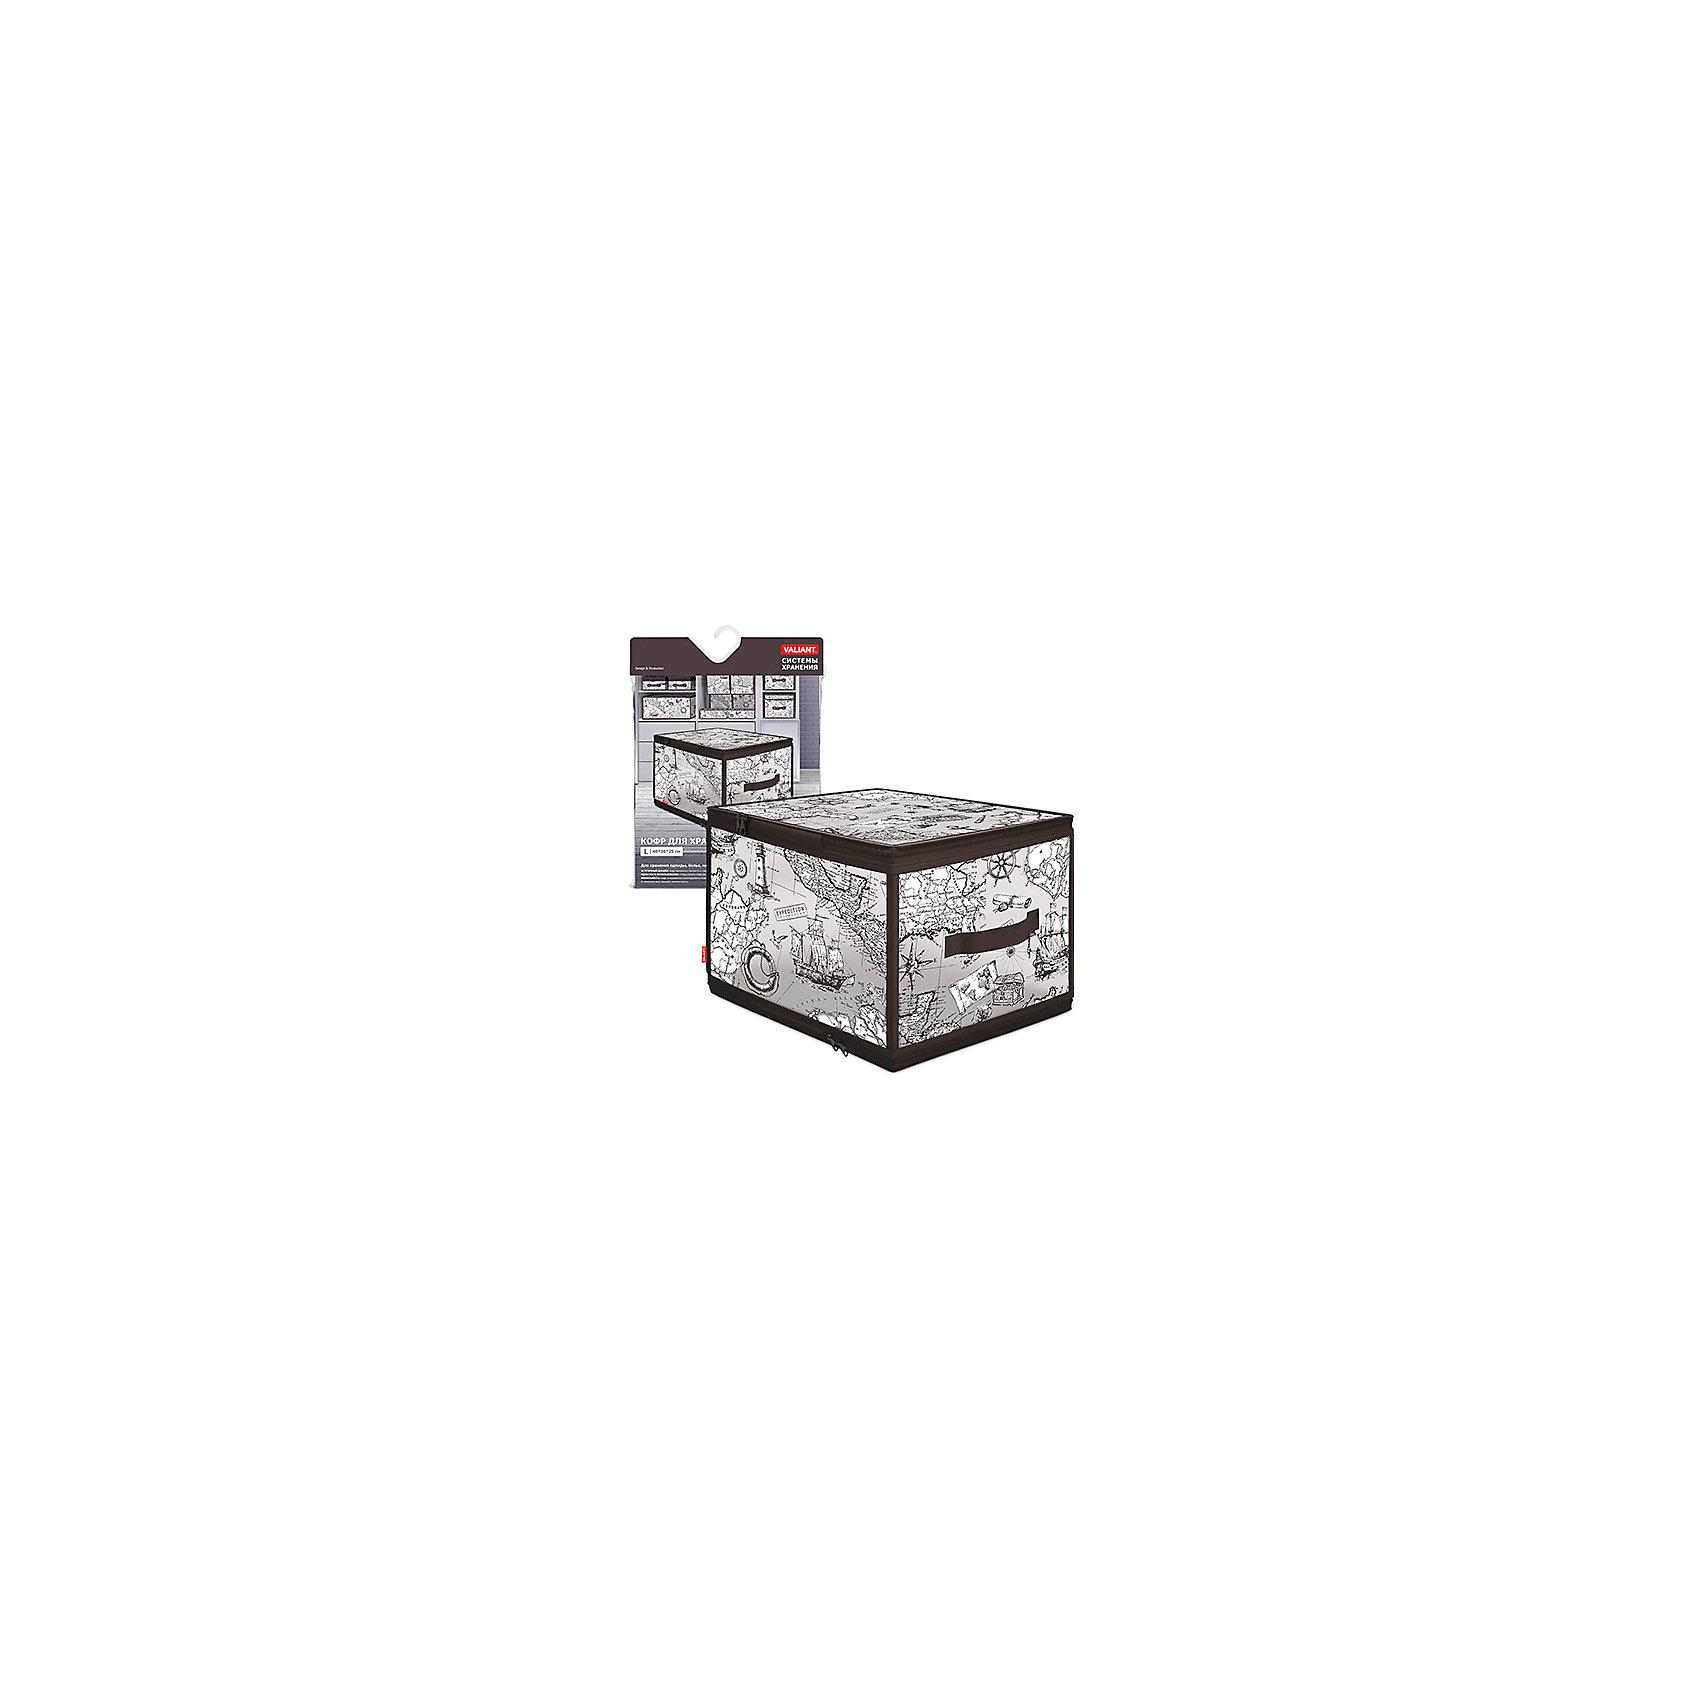 VALIANT Кофр для хранения с застёжкой-молнией, EXPEDITION, Valiant коробки для хранения valiant кофр travelling photos 2 шт